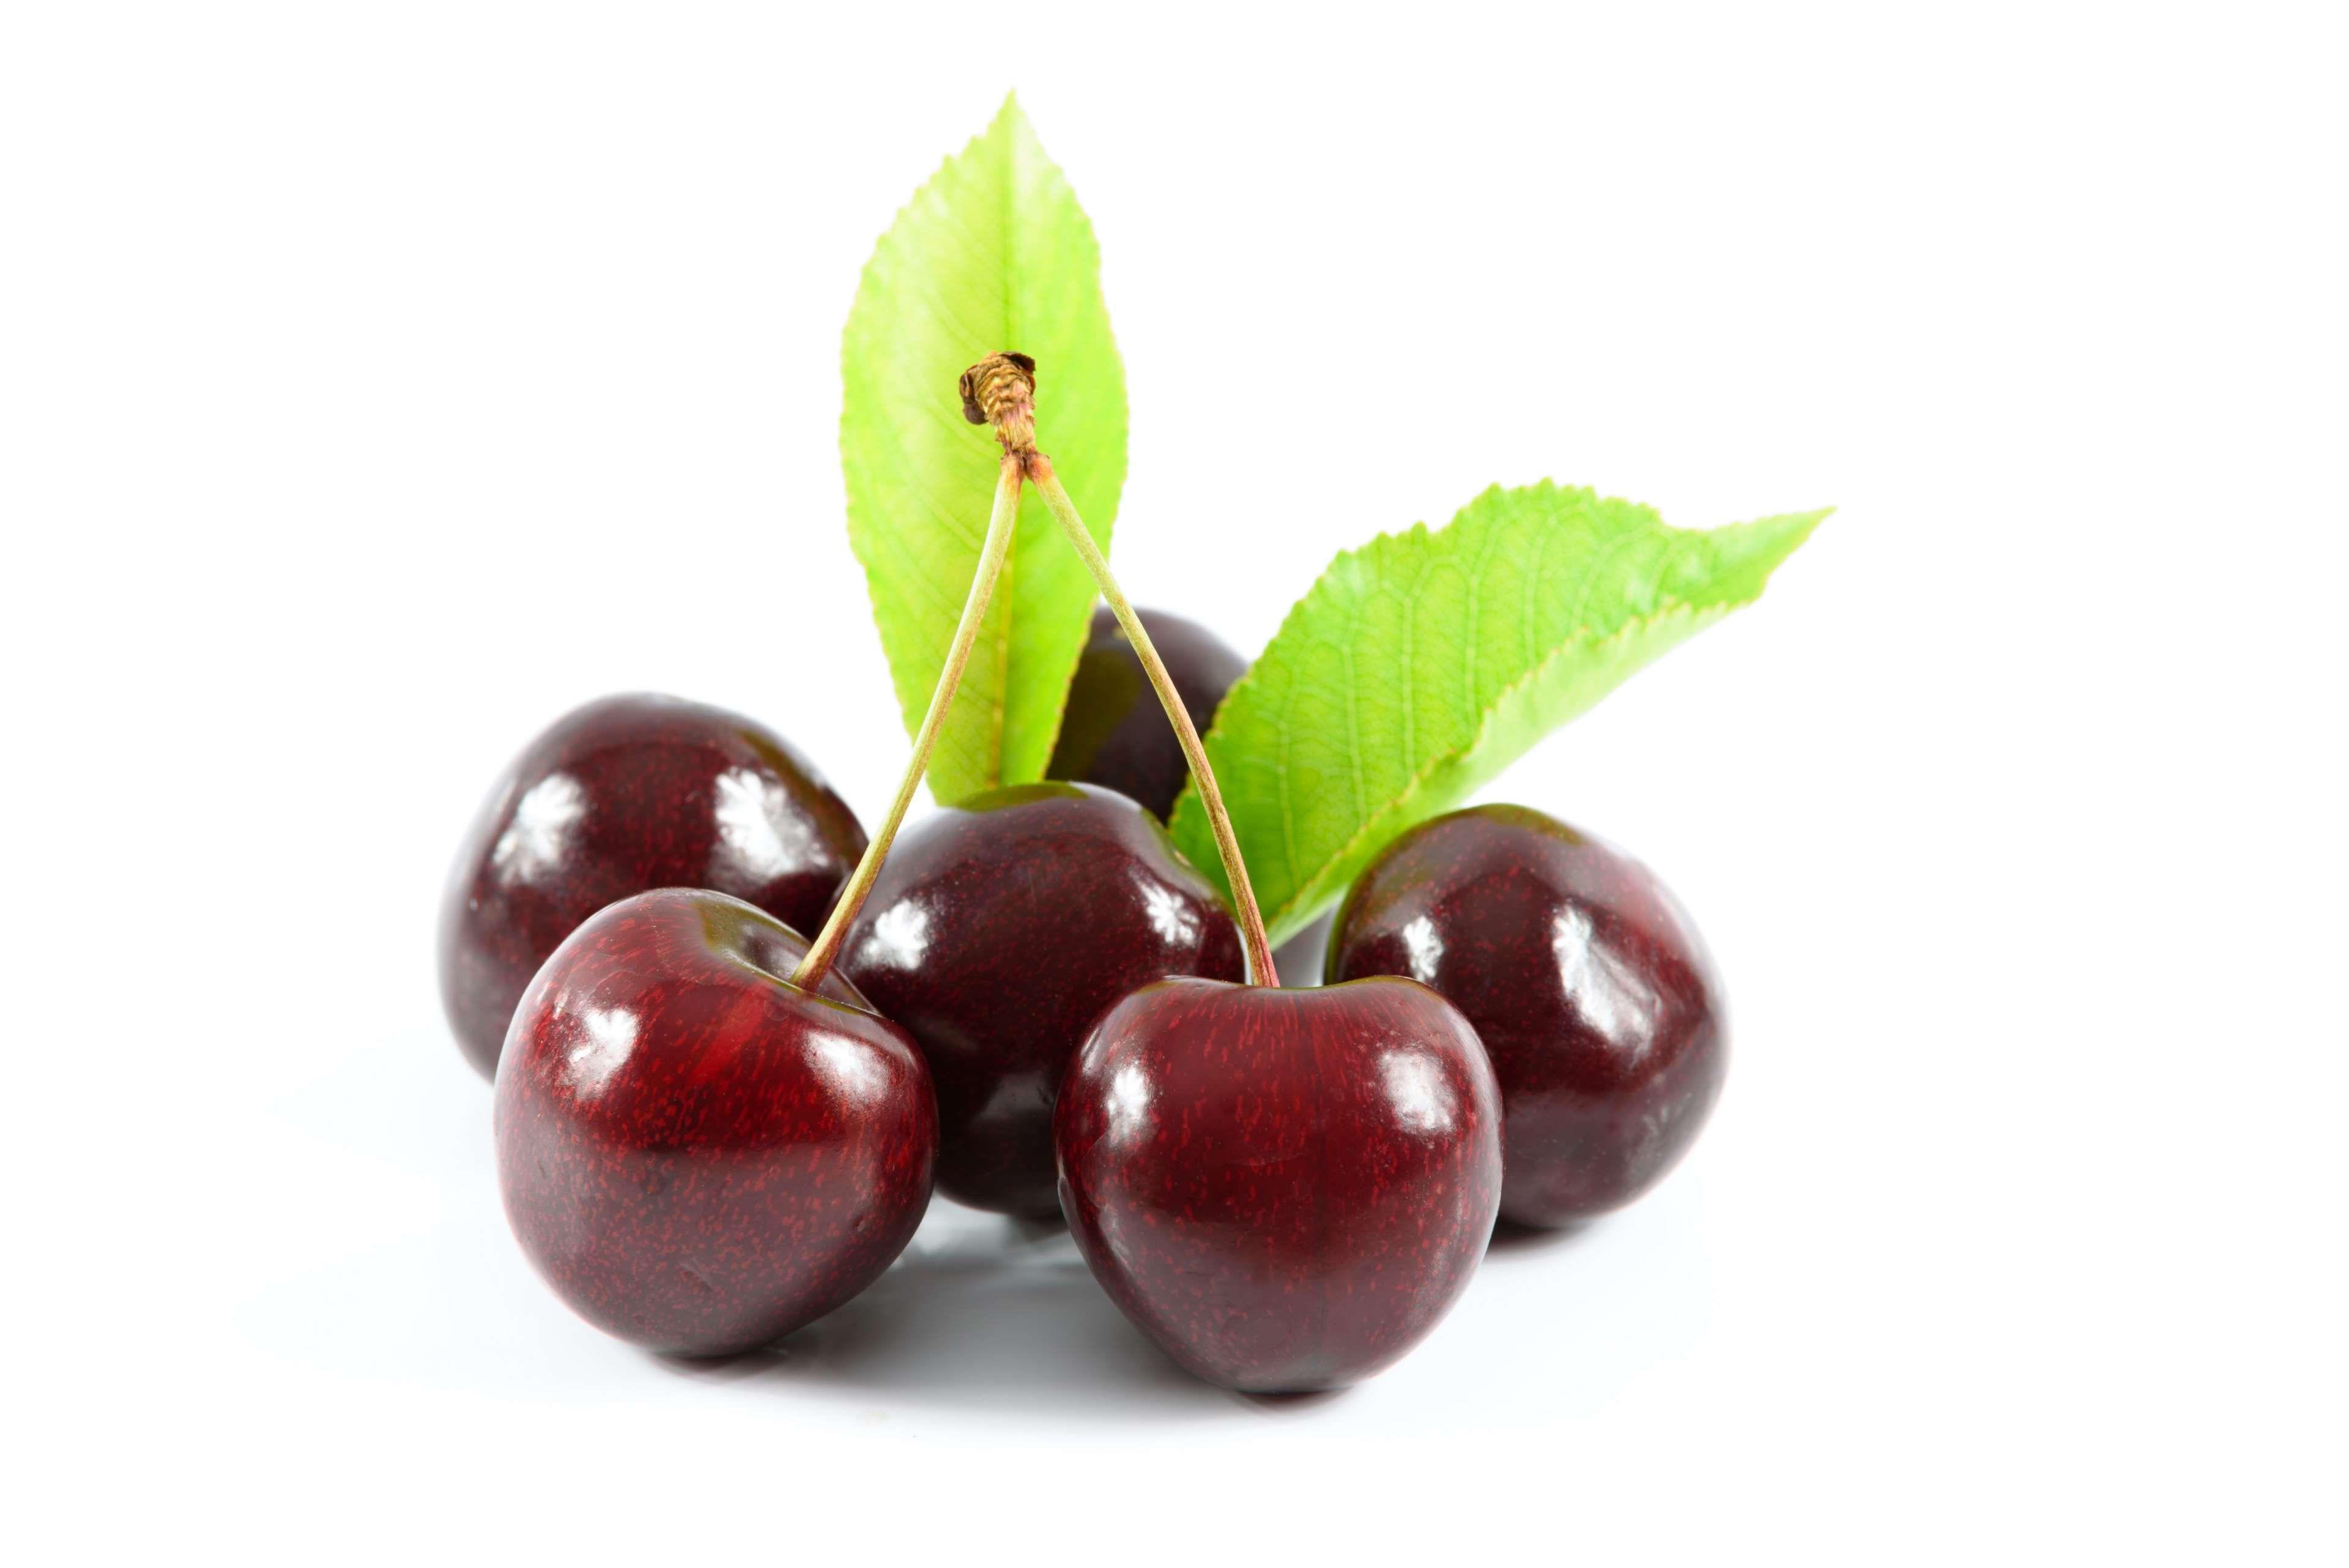 #beautiful #delicious dessert #diet #fresh #fruit #fruit garden #health #healthy nutrition #natural #red #ripe cherries #sweet cherries #sweet dish